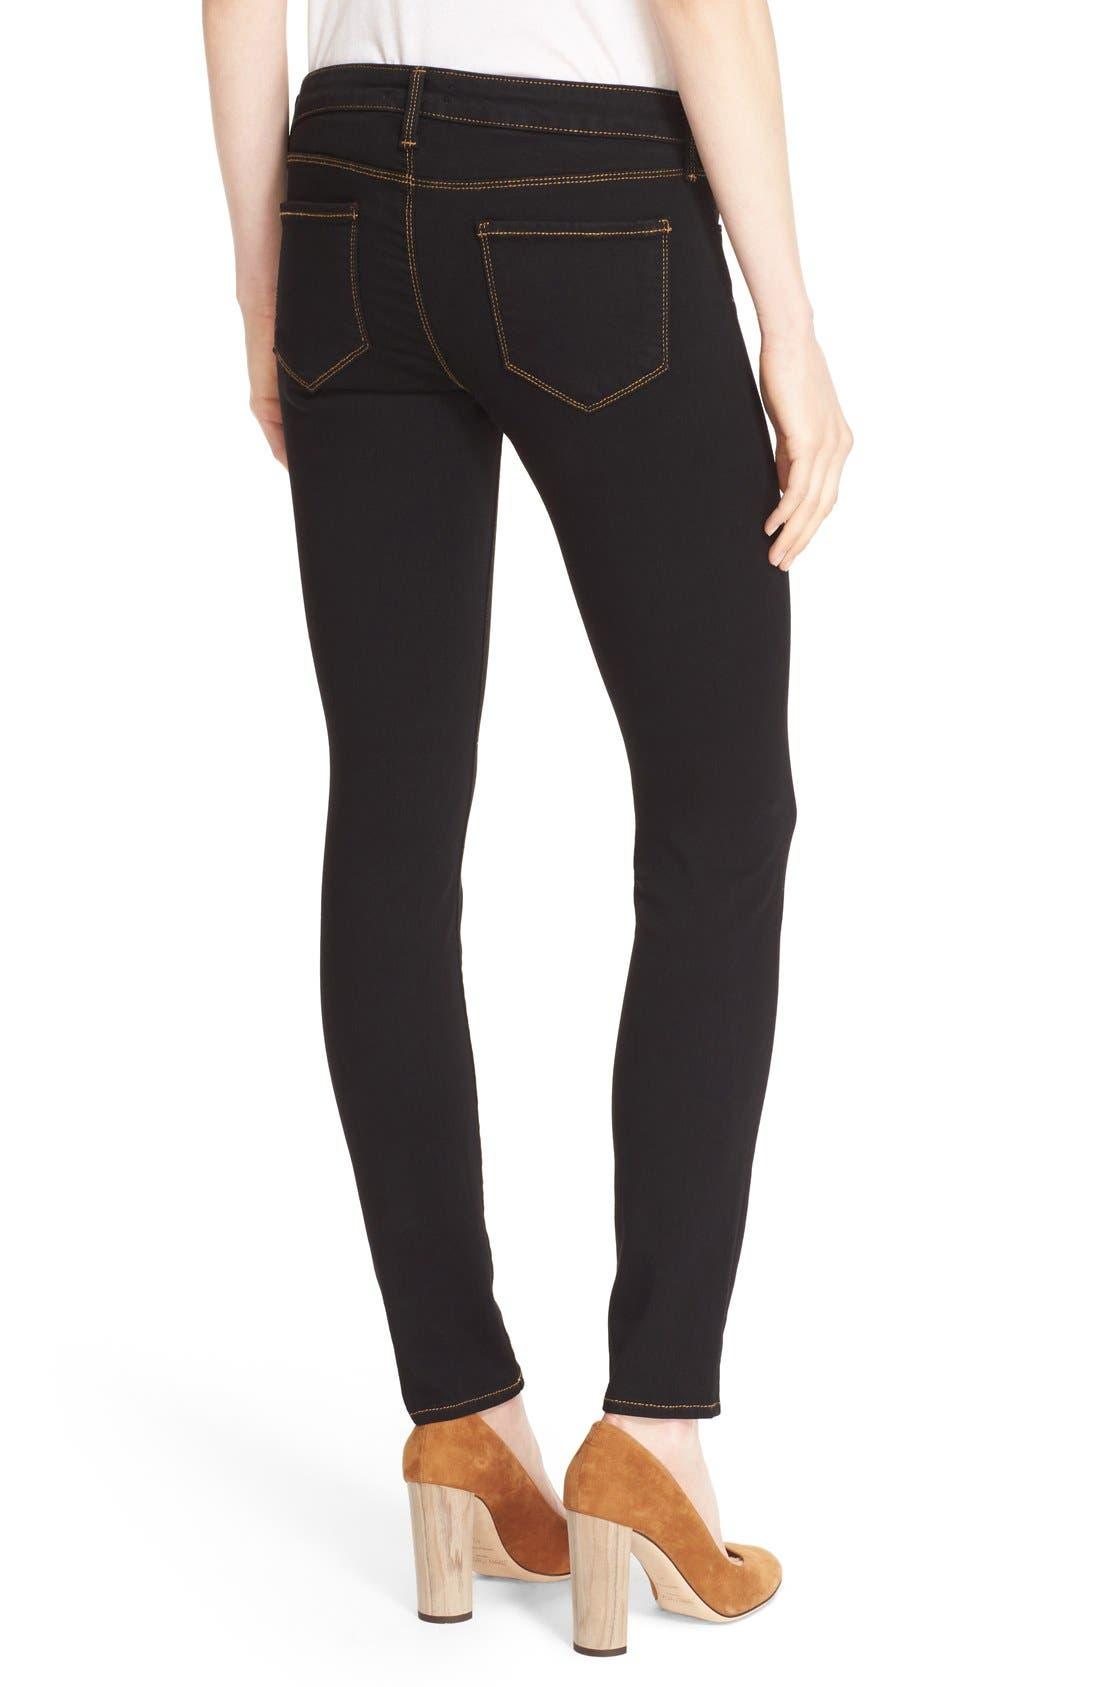 L'AGENCE,                             'Chantal' Skinny Jeans,                             Alternate thumbnail 5, color,                             001